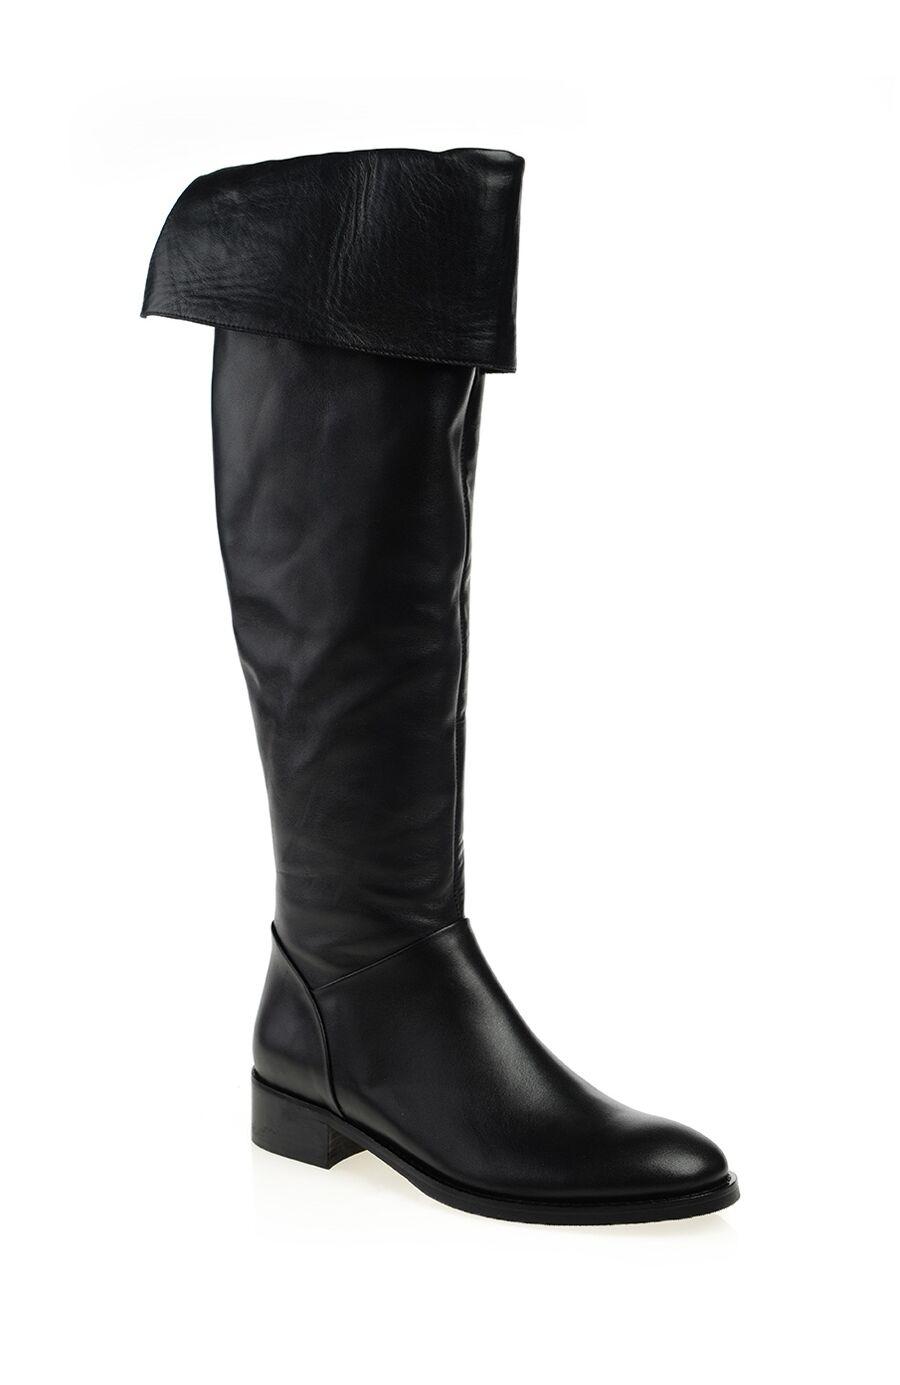 – Siyah Deri Çizme – 359.0 TL